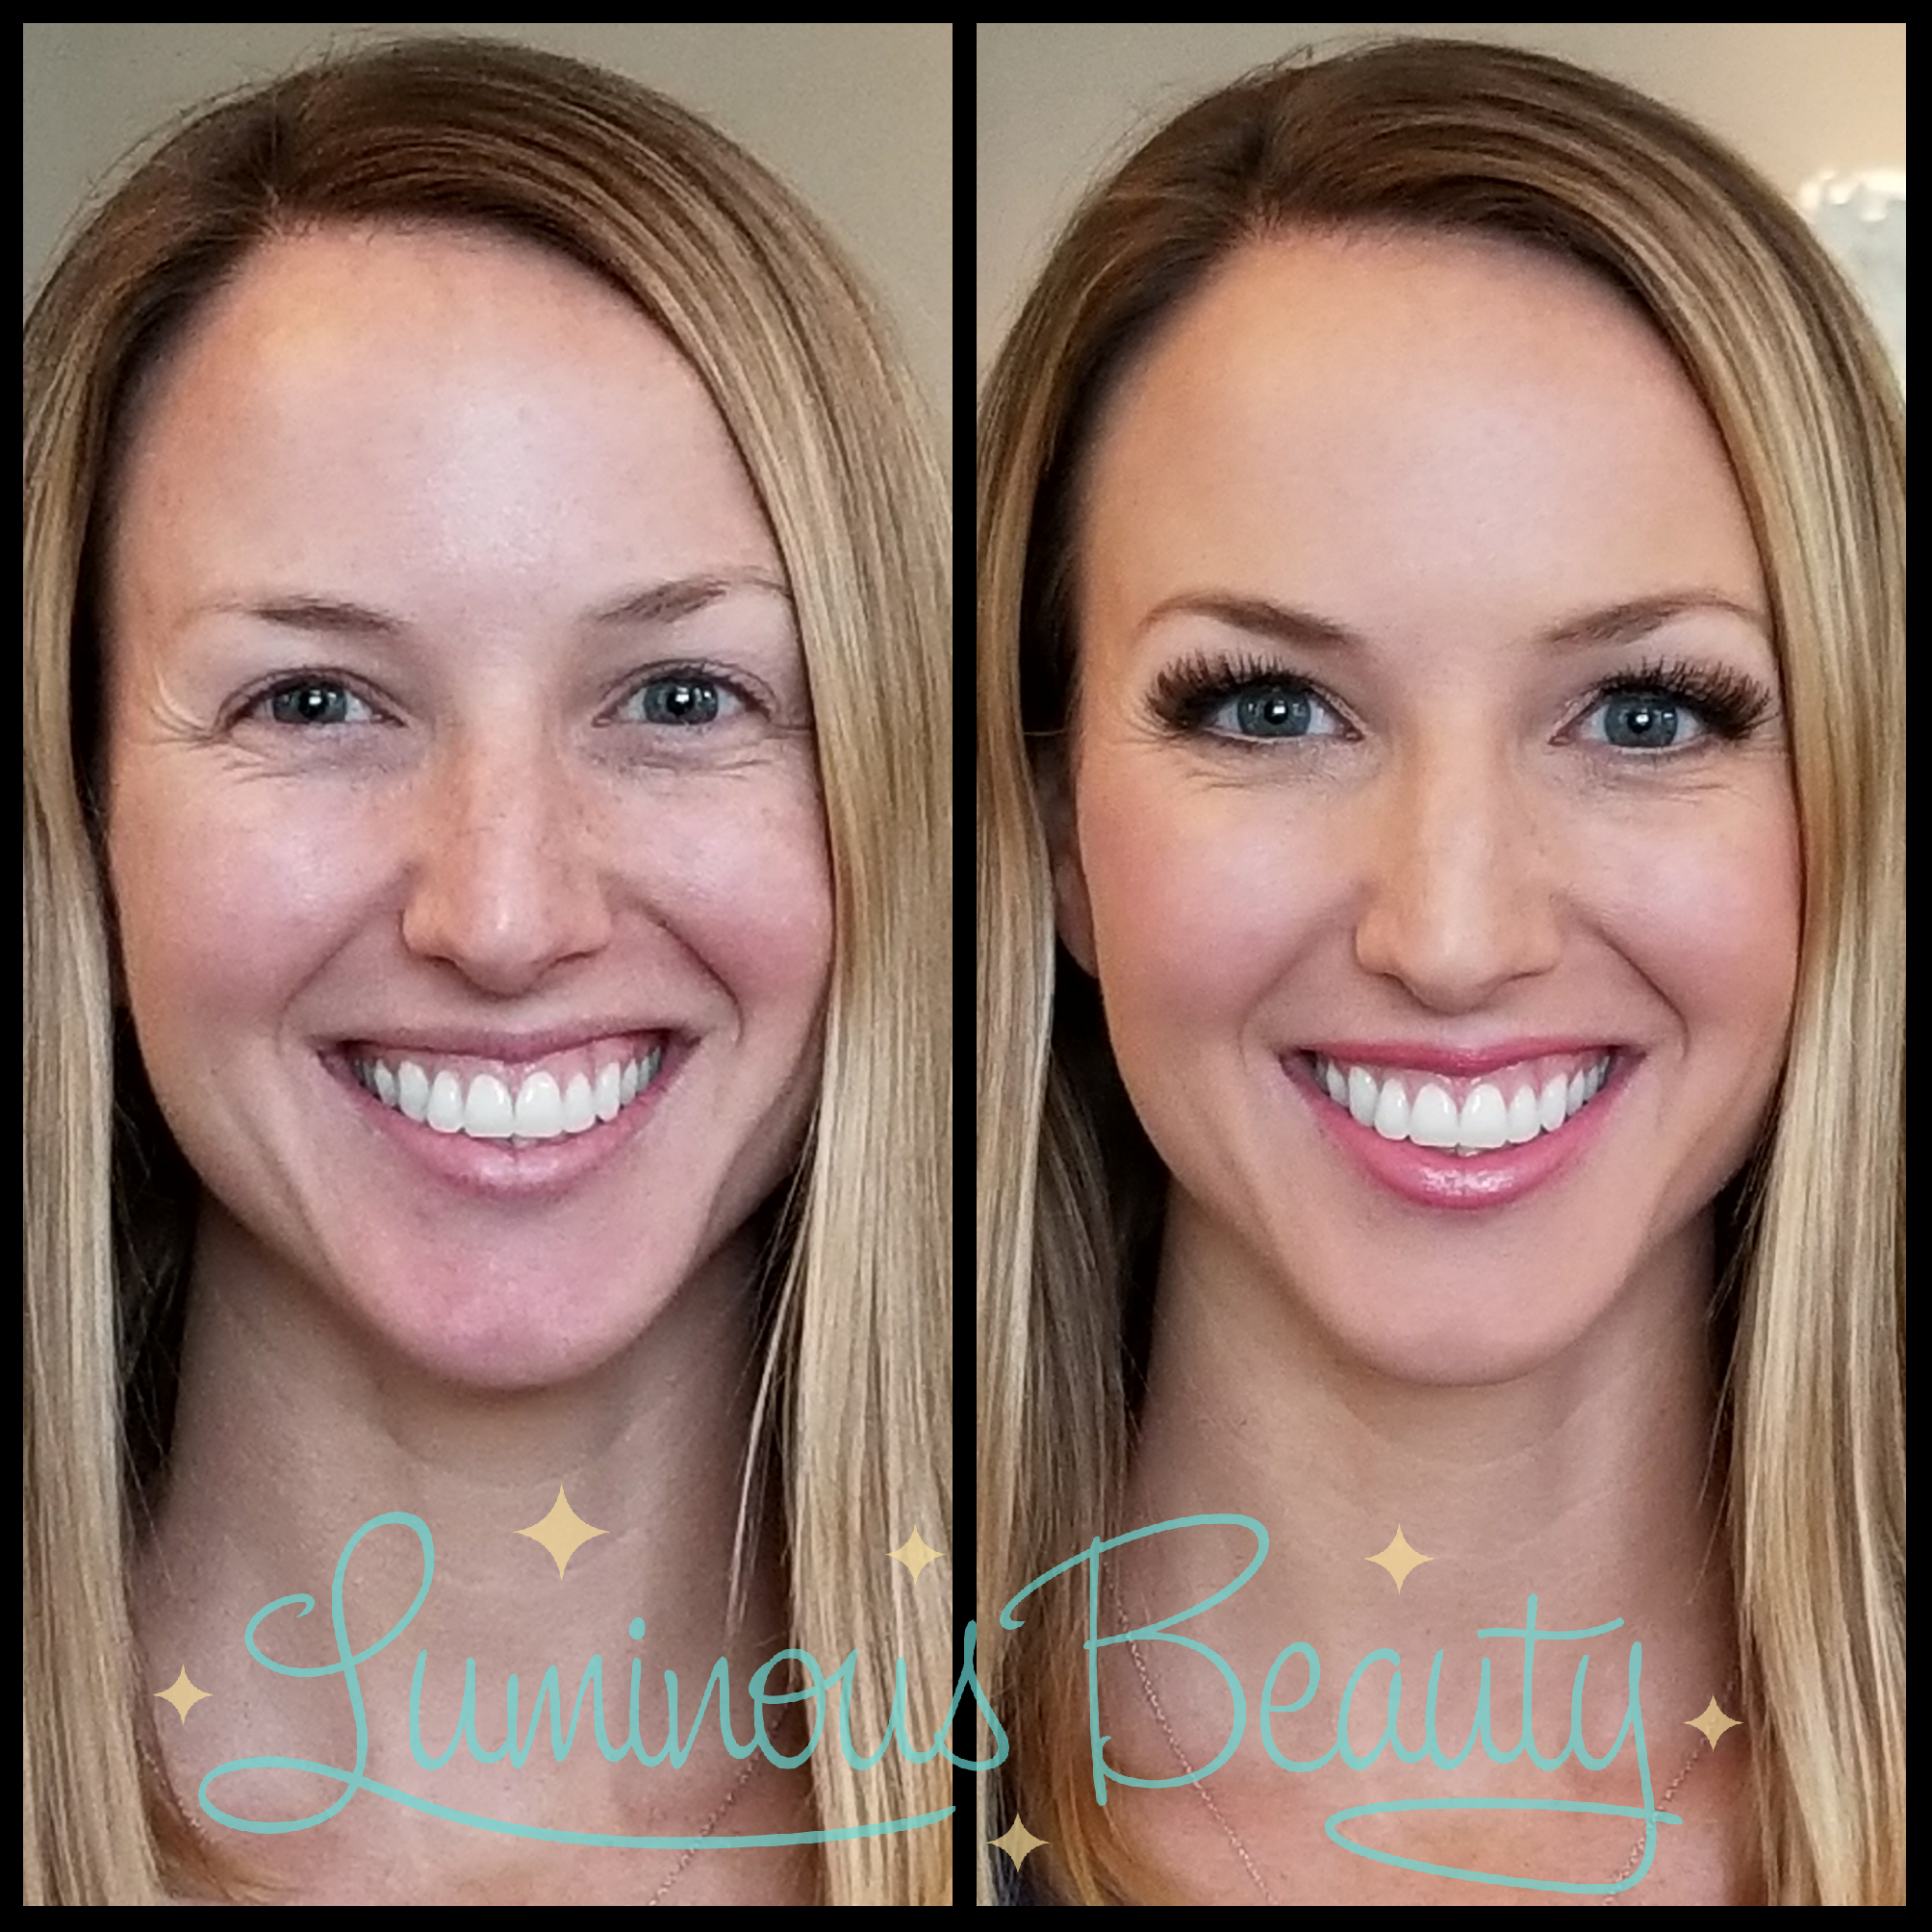 Glowy Skin, Bright Eyes and Pink Cheeks. Aibrush Makeup with False Lashes Bridesmaids Makeup. Luminous Beauty Makeup Artist..png